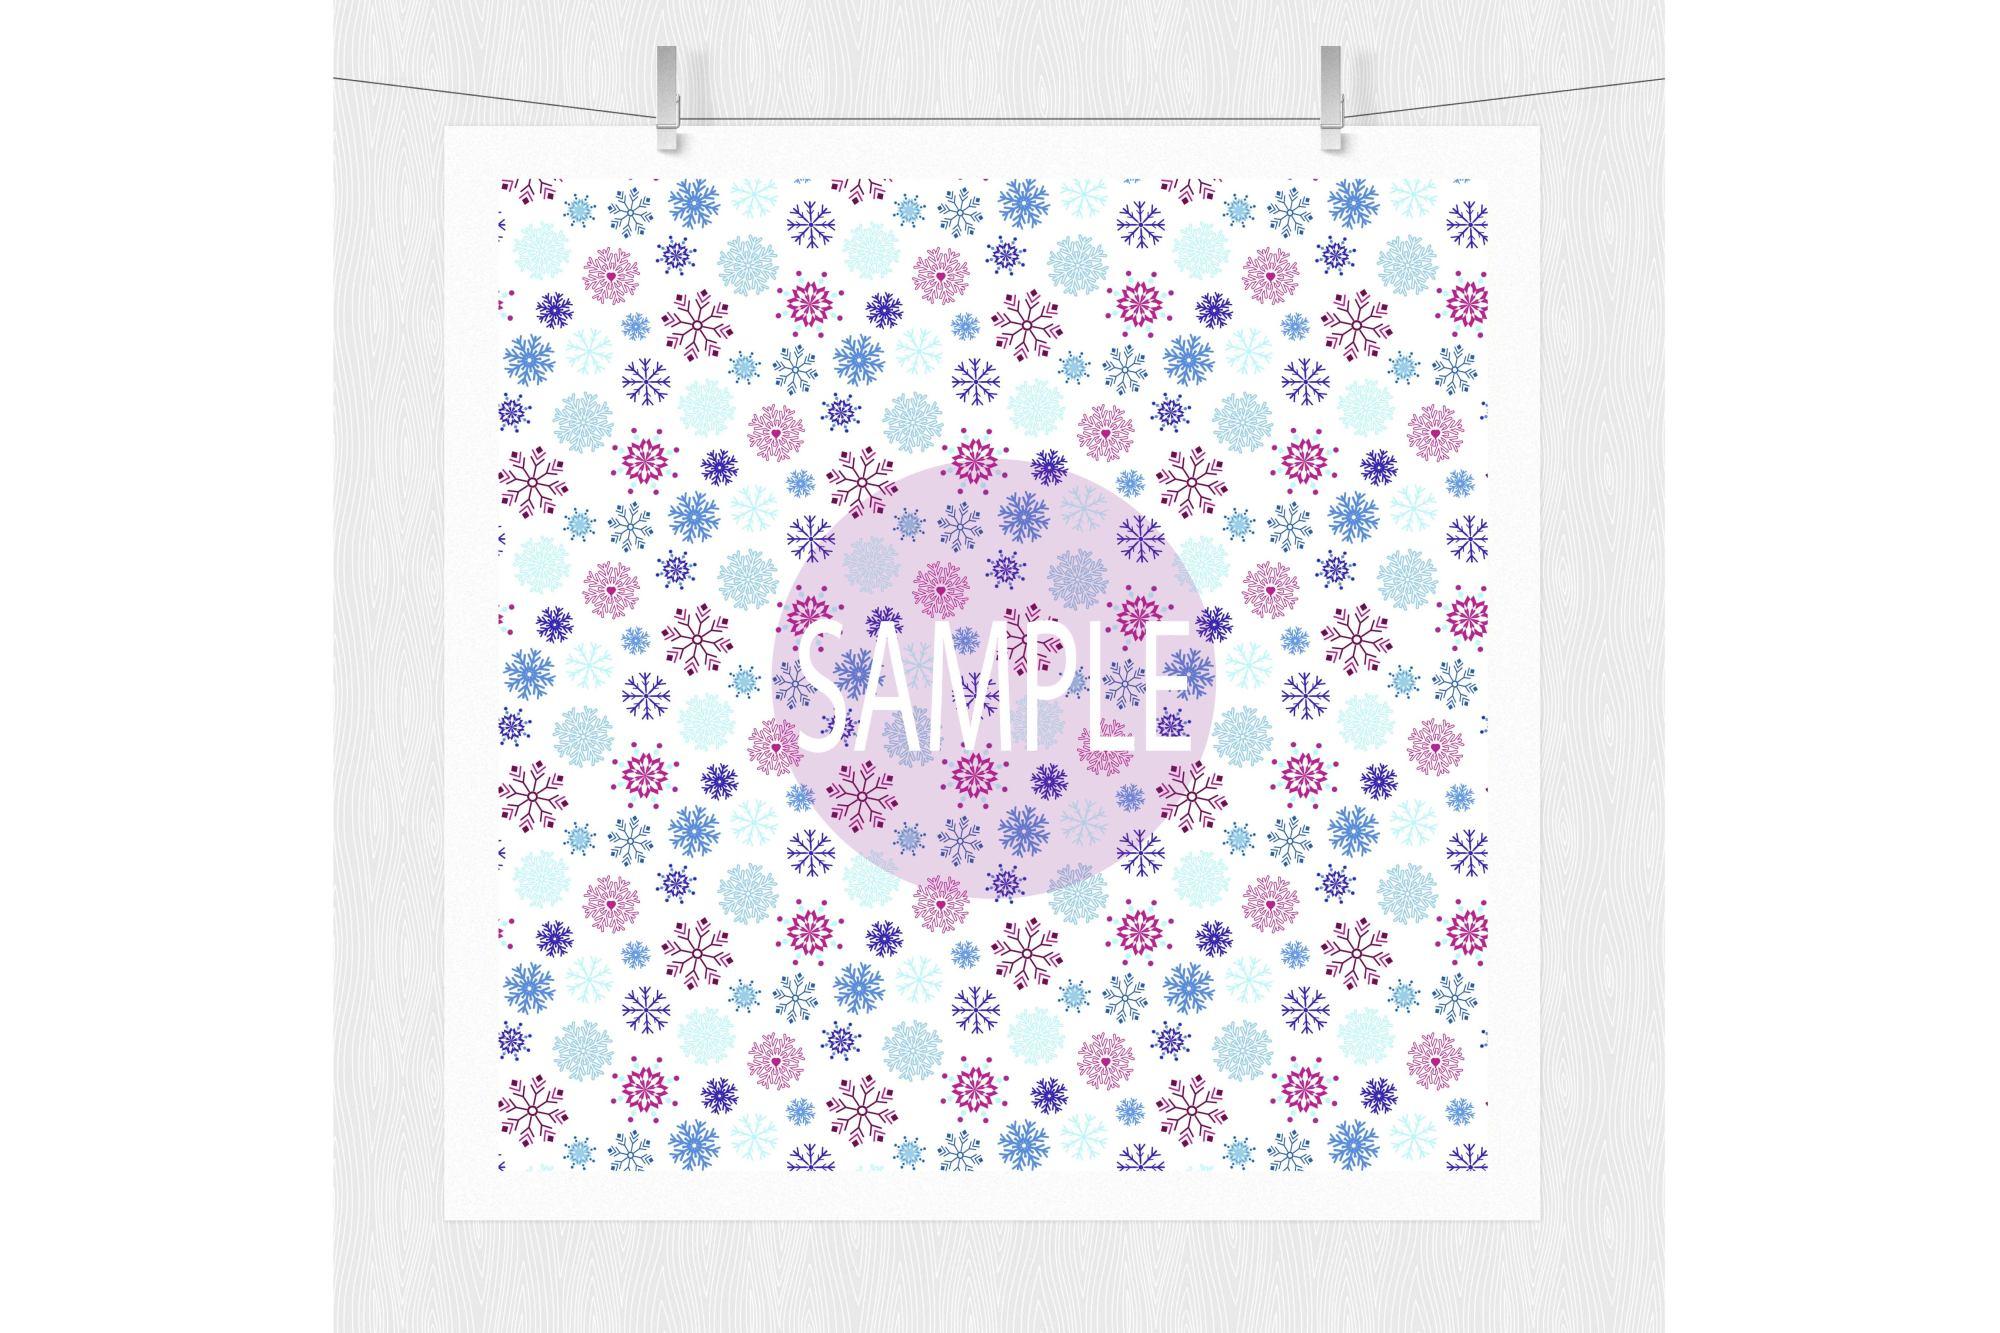 Frozen Digital Paper - Pattern Design example image 2